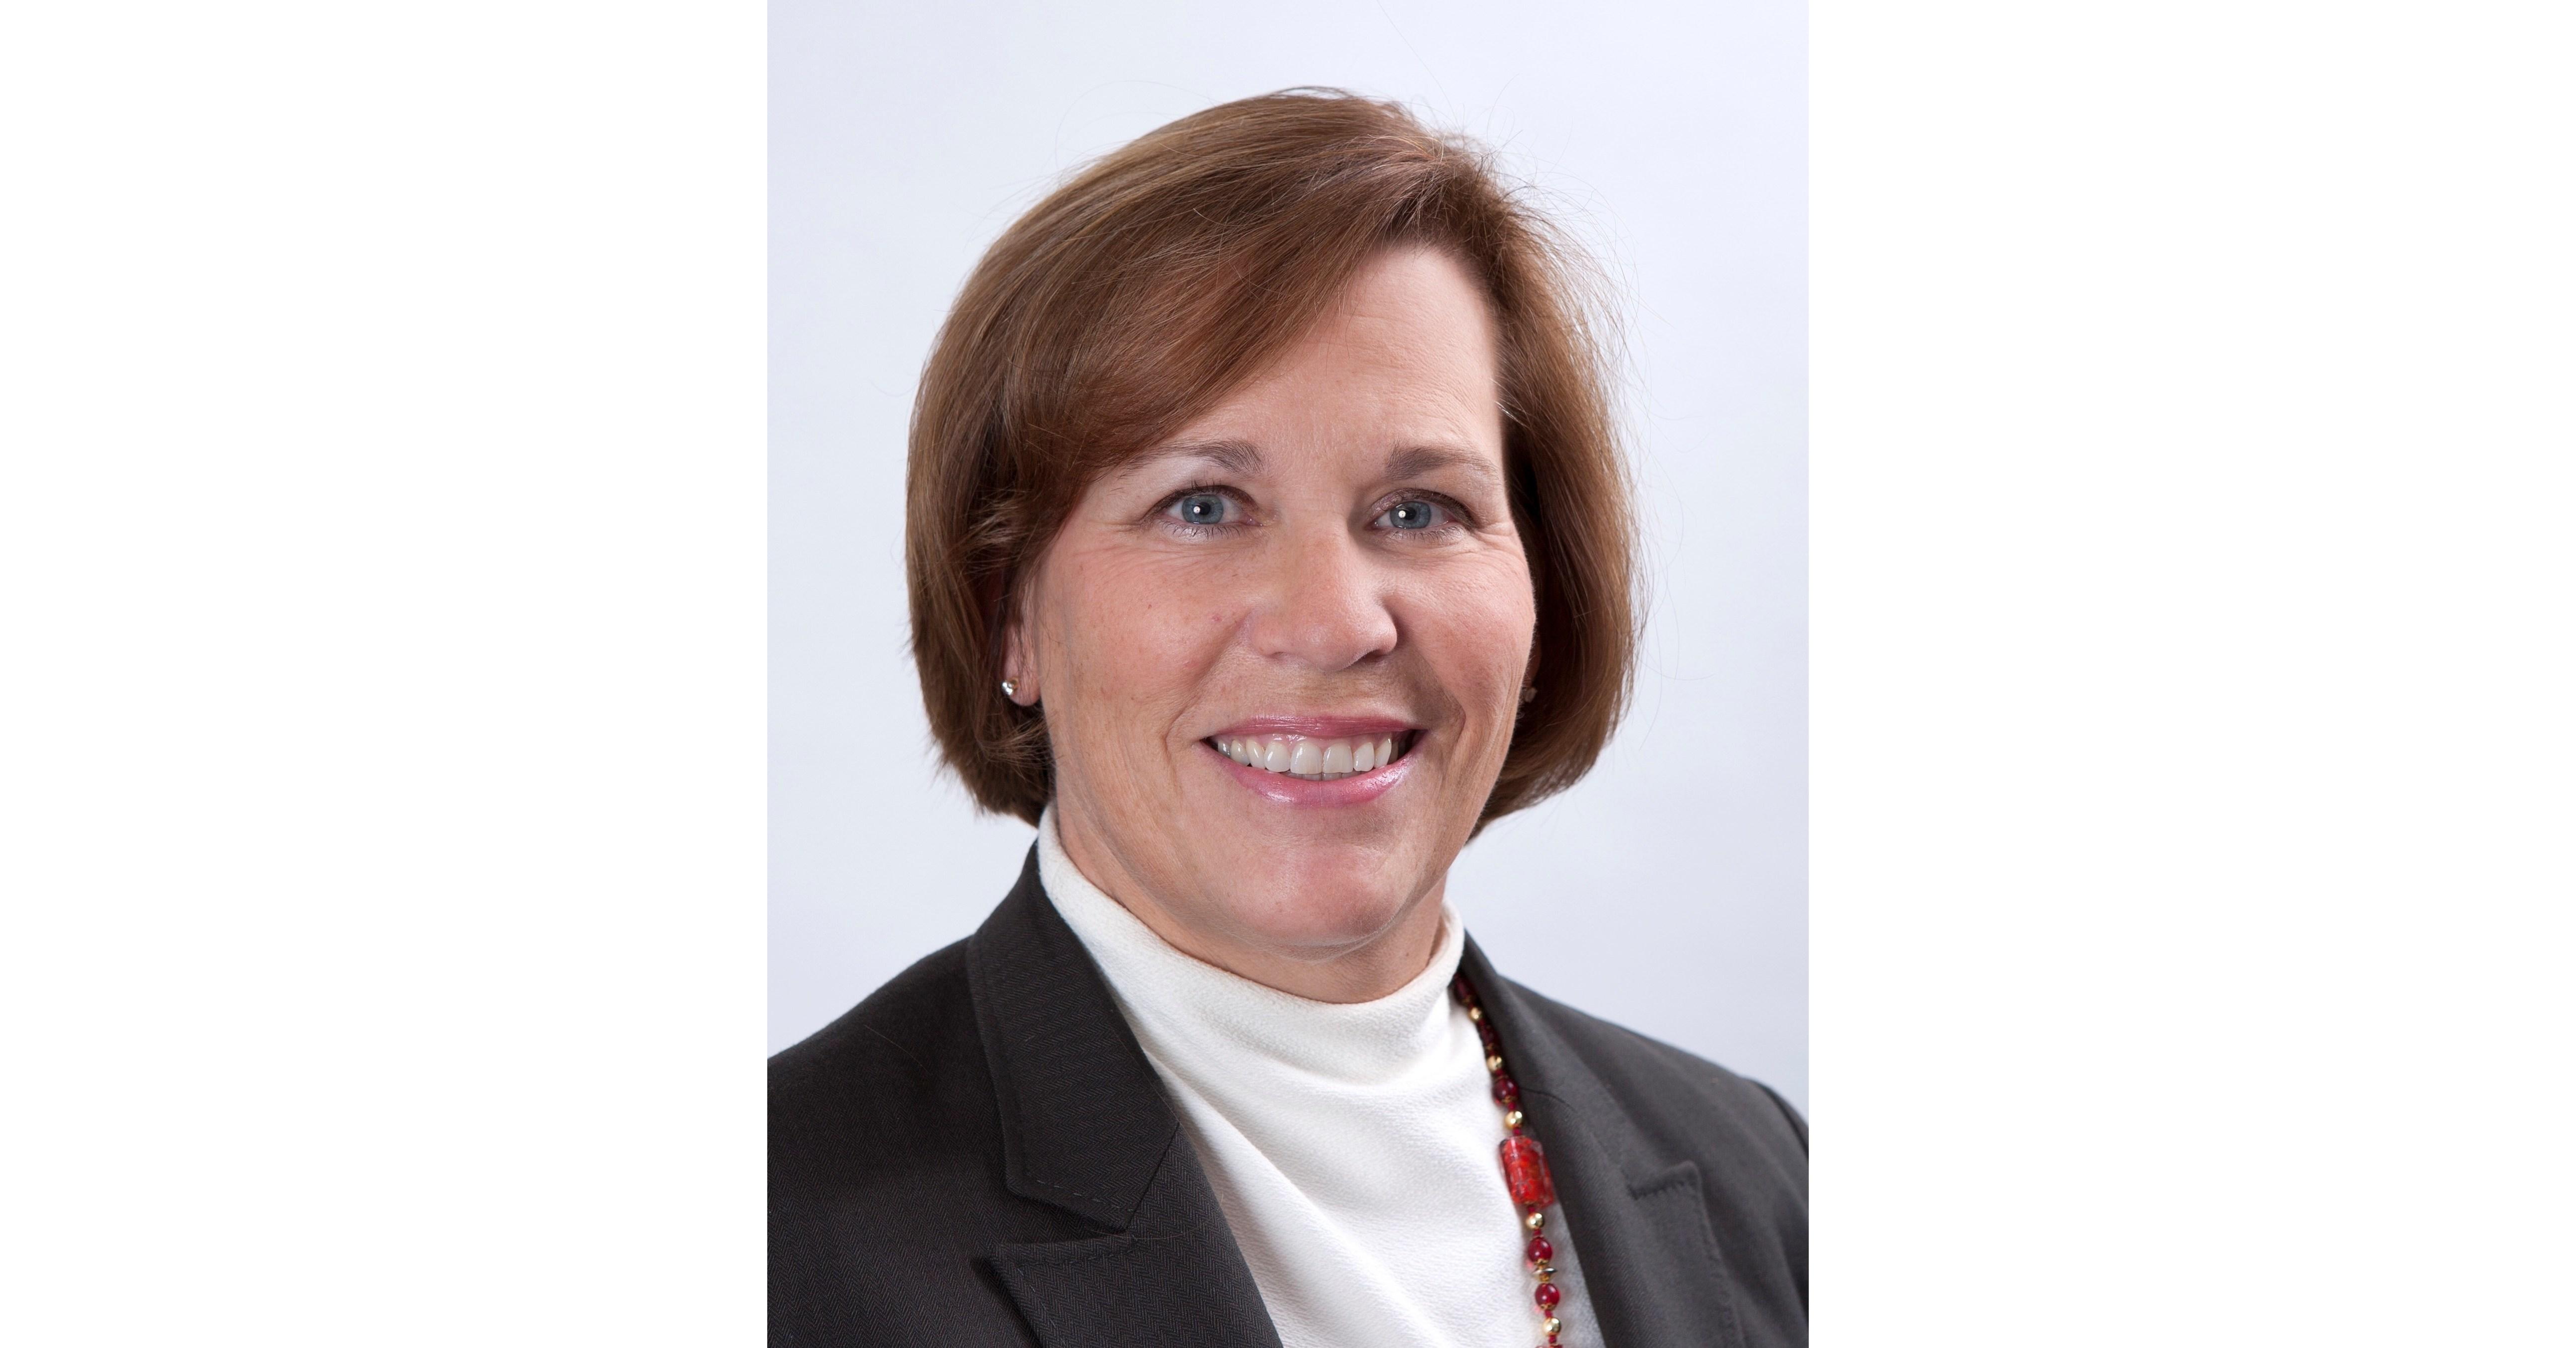 Entergy Corporation Board Elects Lisa Hyland as Board Member